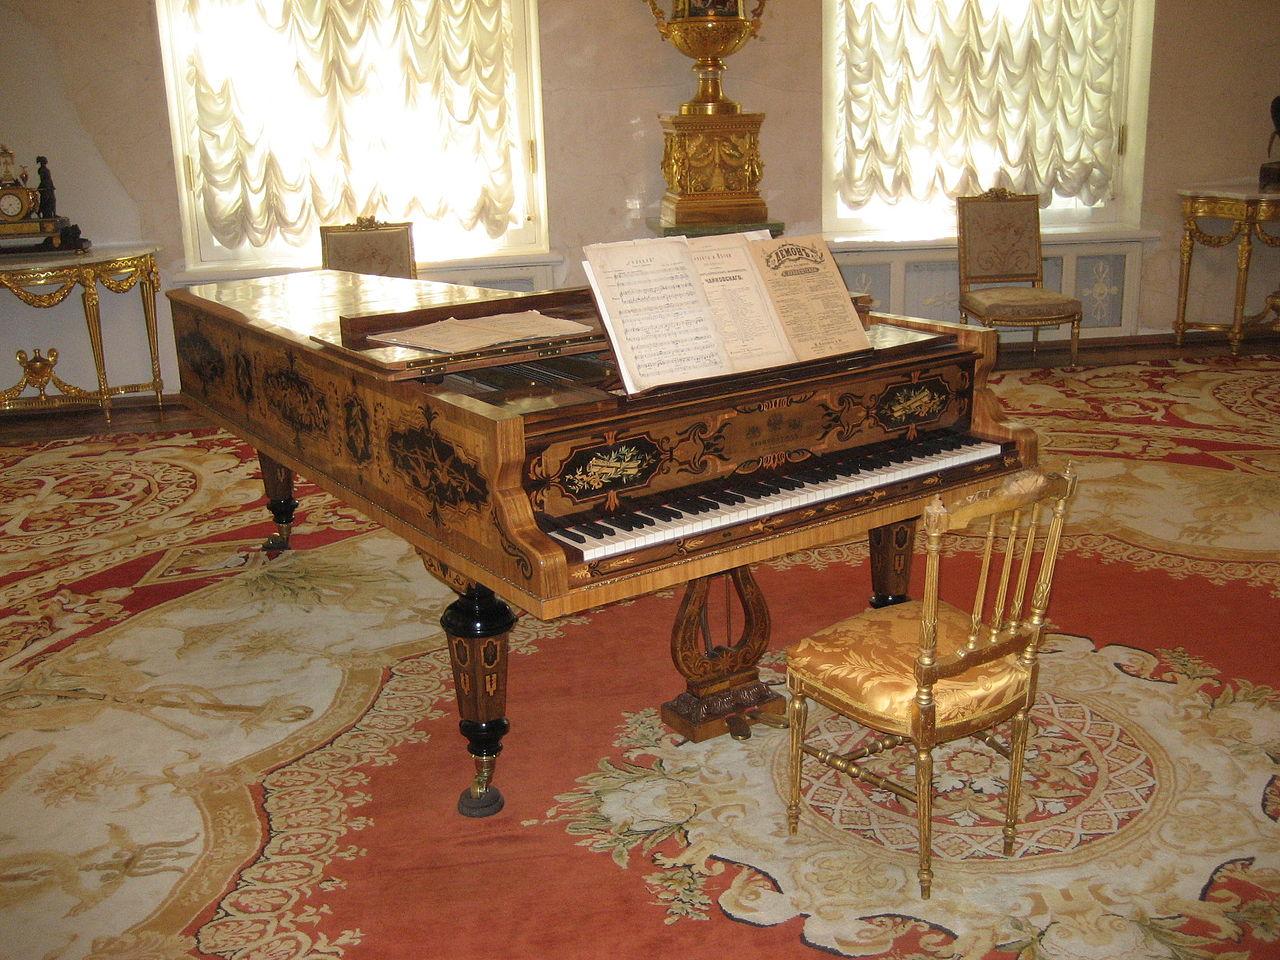 ФасадАлександровский дворец, пианино в парадном зале дворца